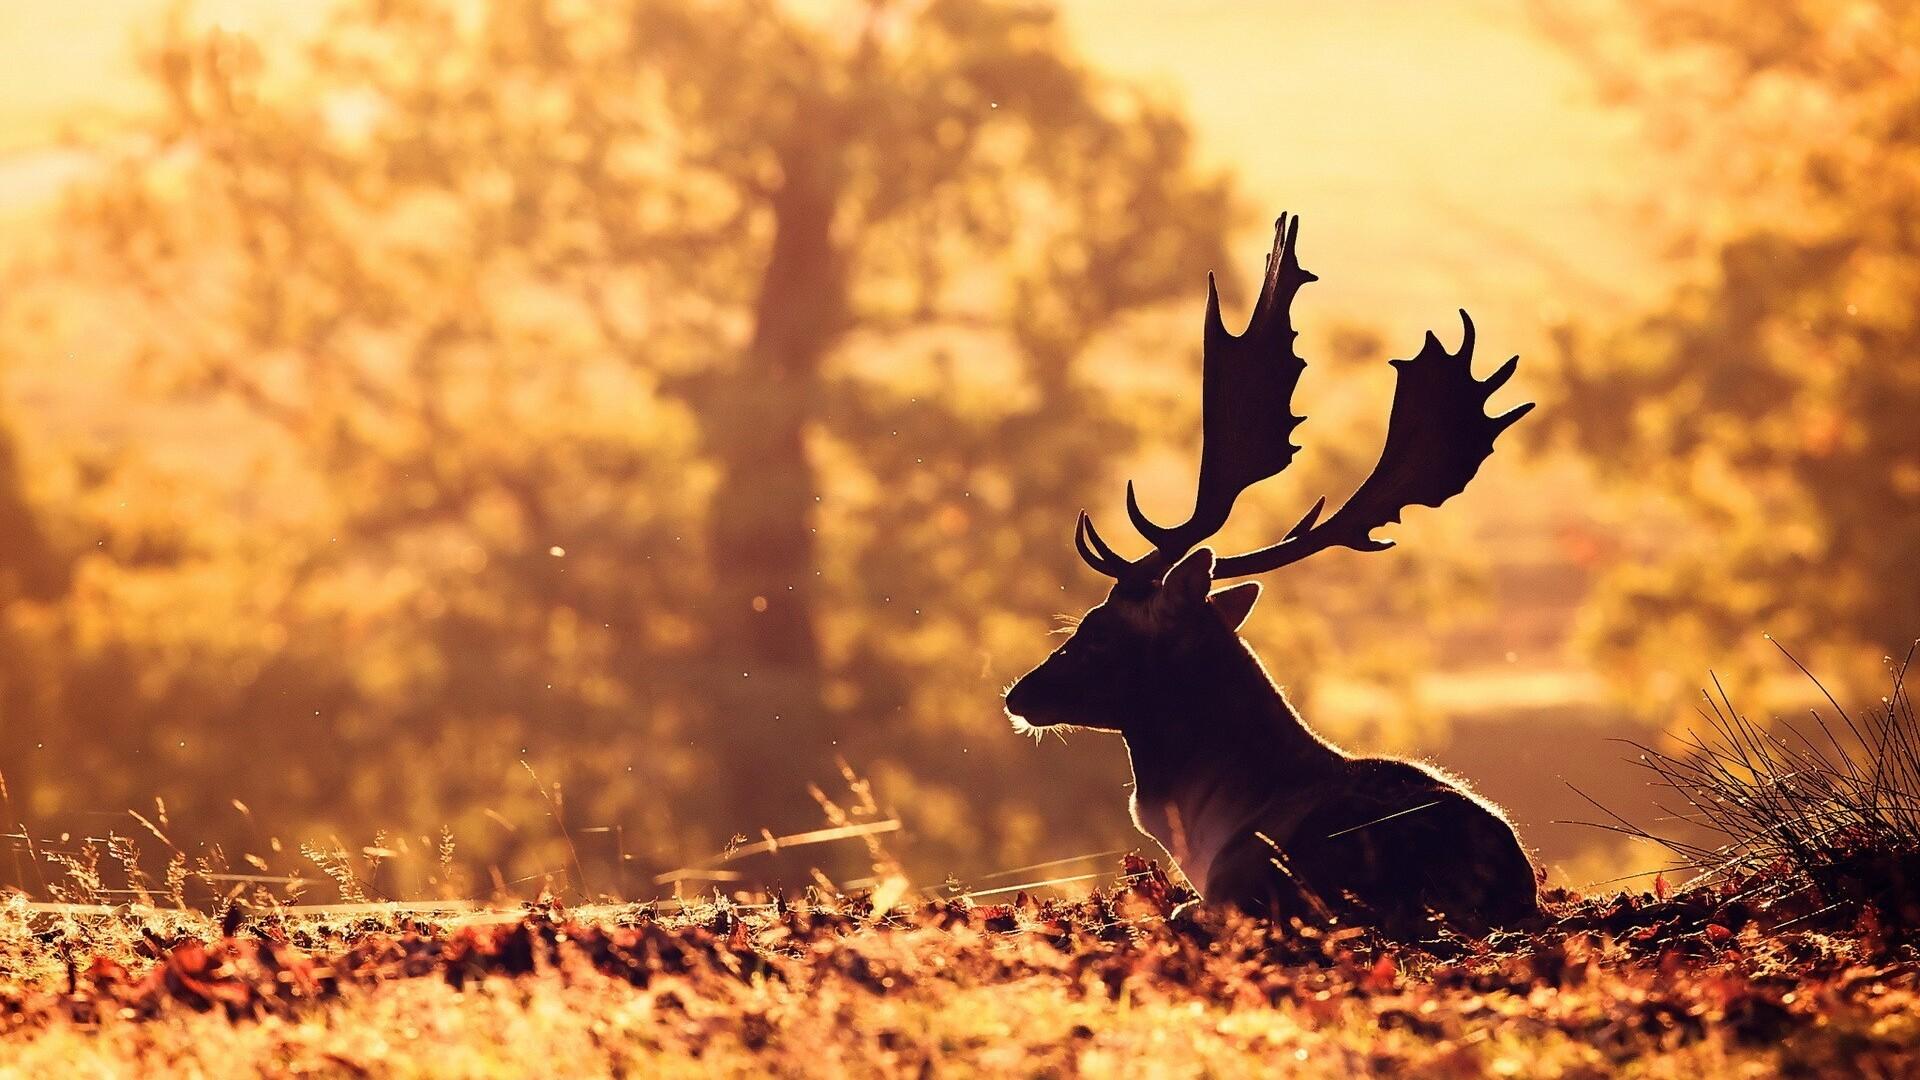 Deer Wallpapers Apps on Google